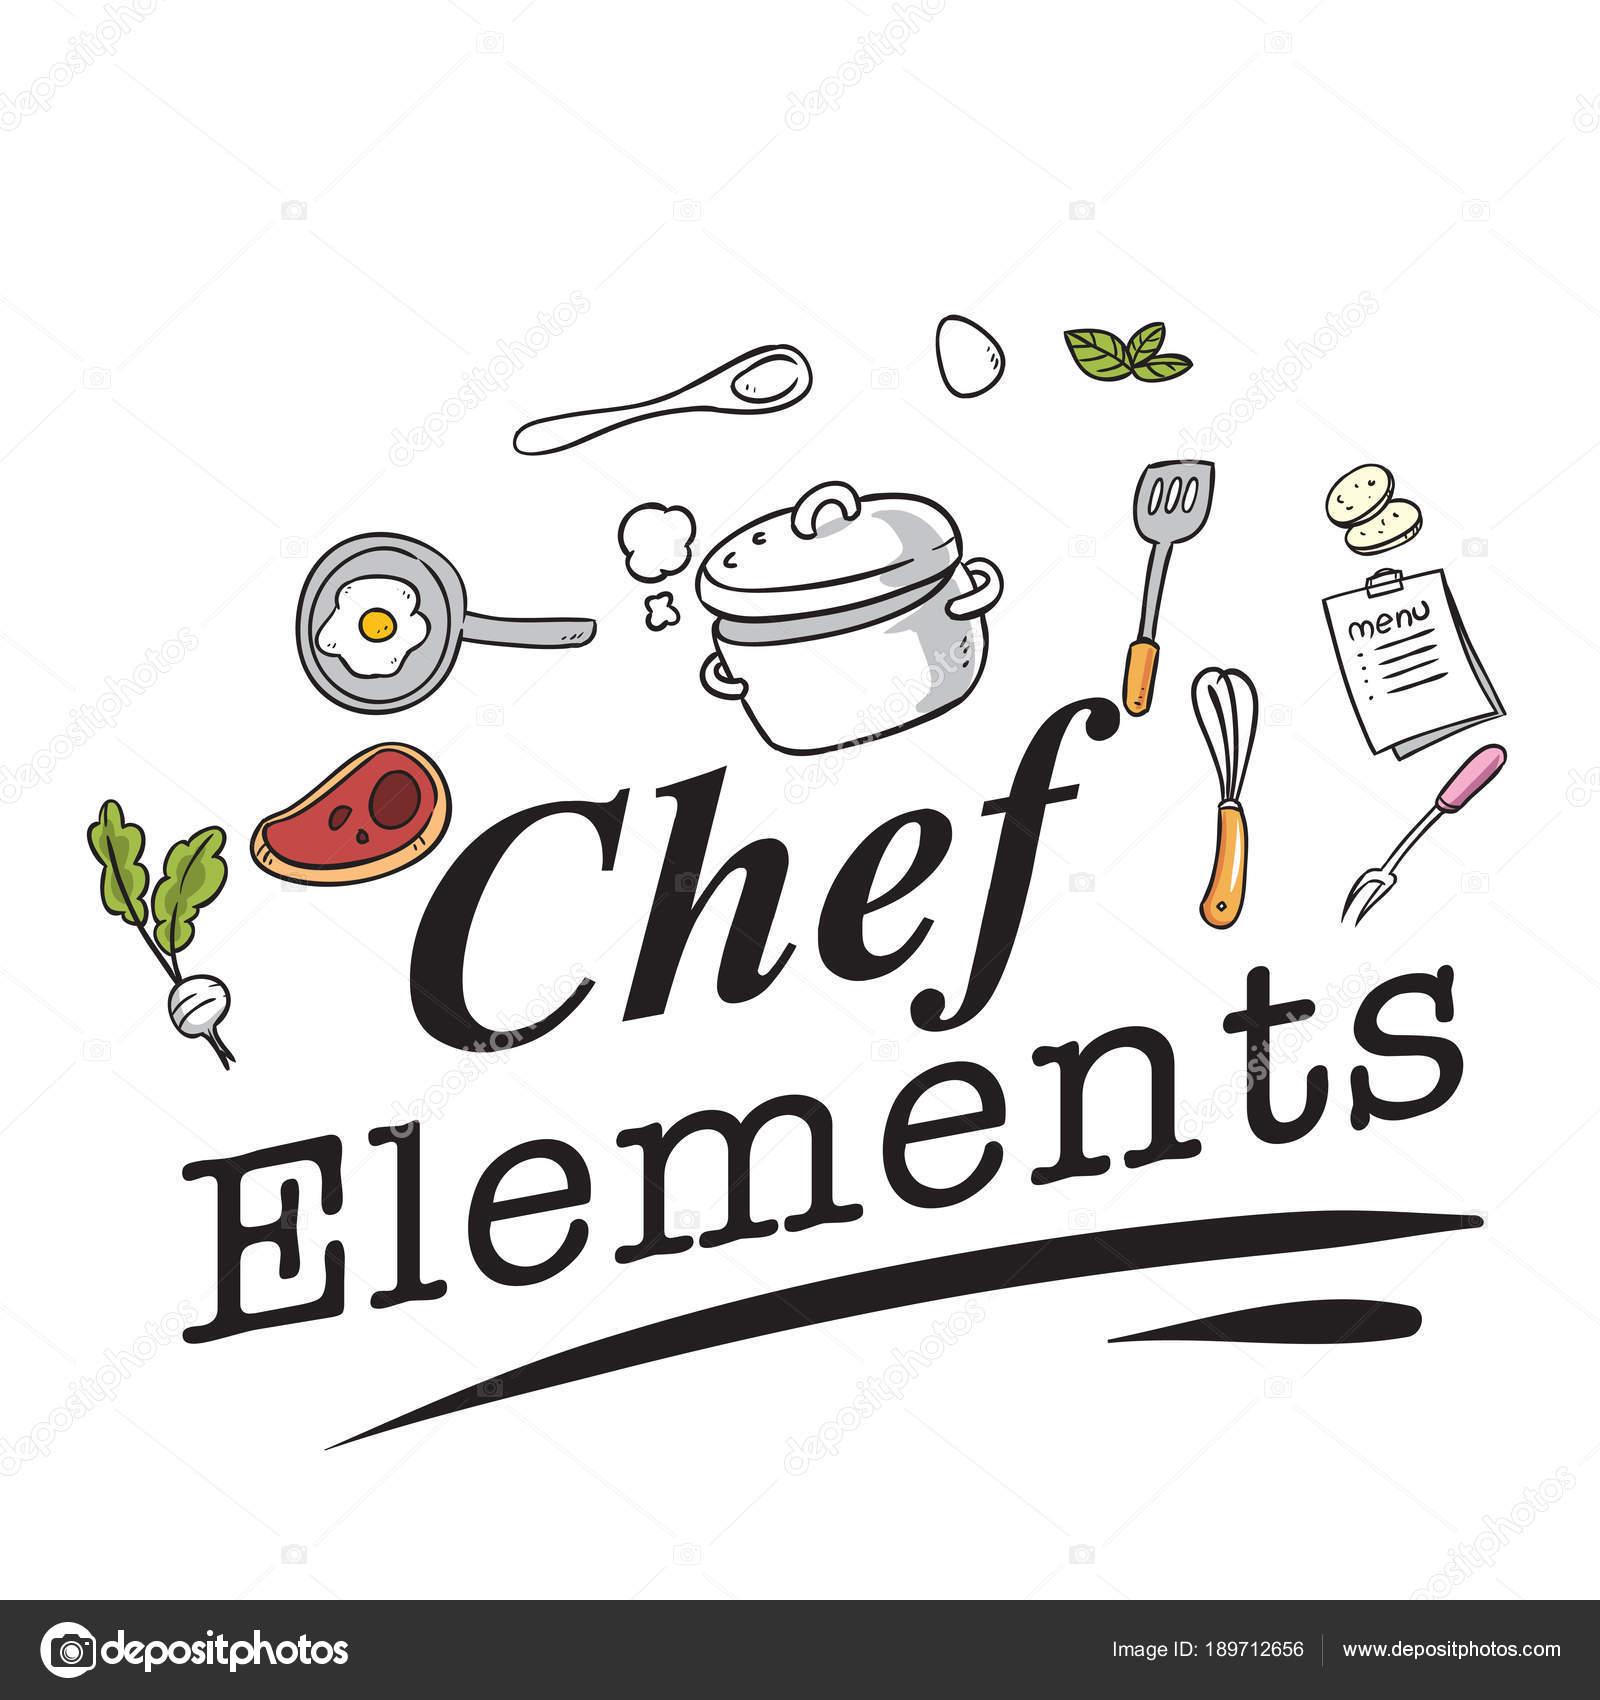 Utensilios cocina chef elementos fondo blanco vector for Elementos de cocina para chef